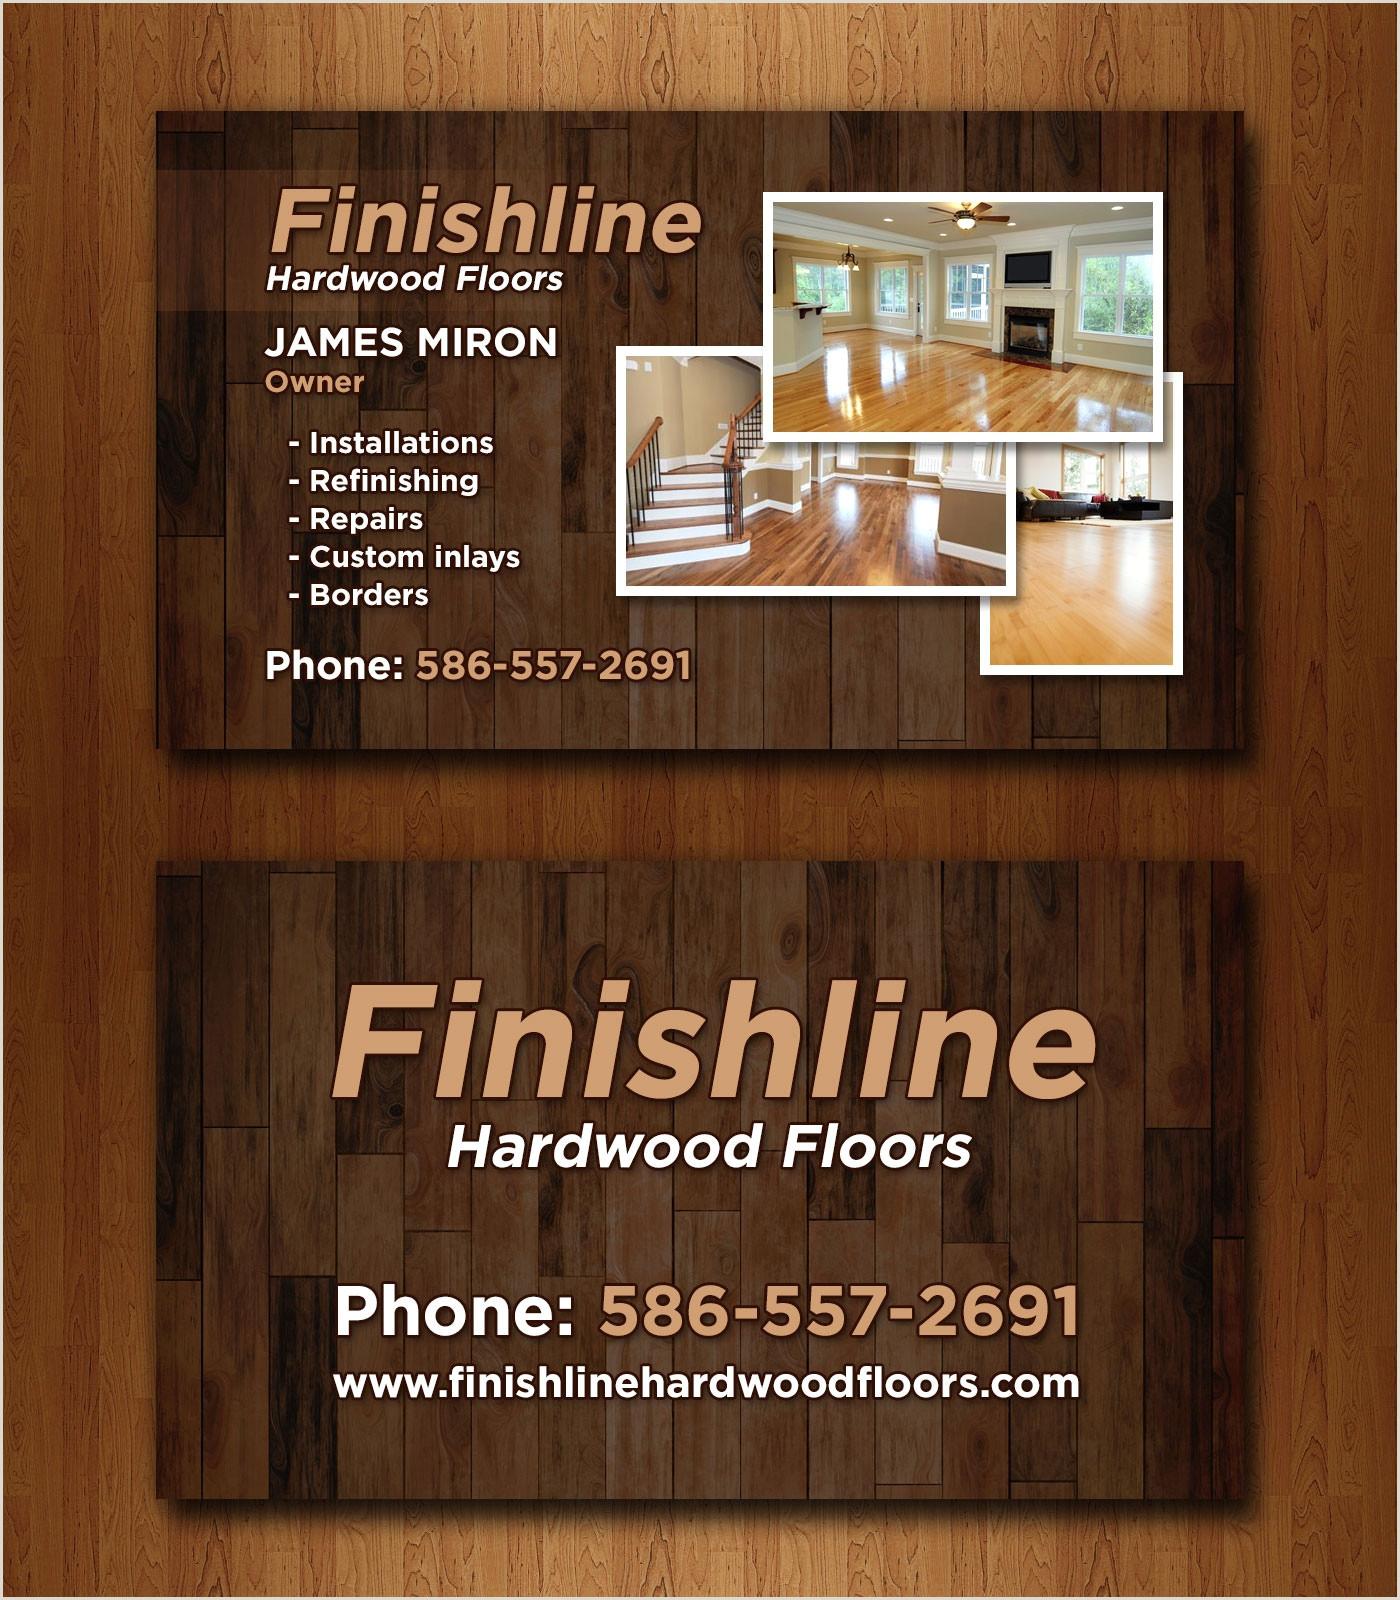 The Best Business Cards 14 Popular Hardwood Flooring Business Card Template